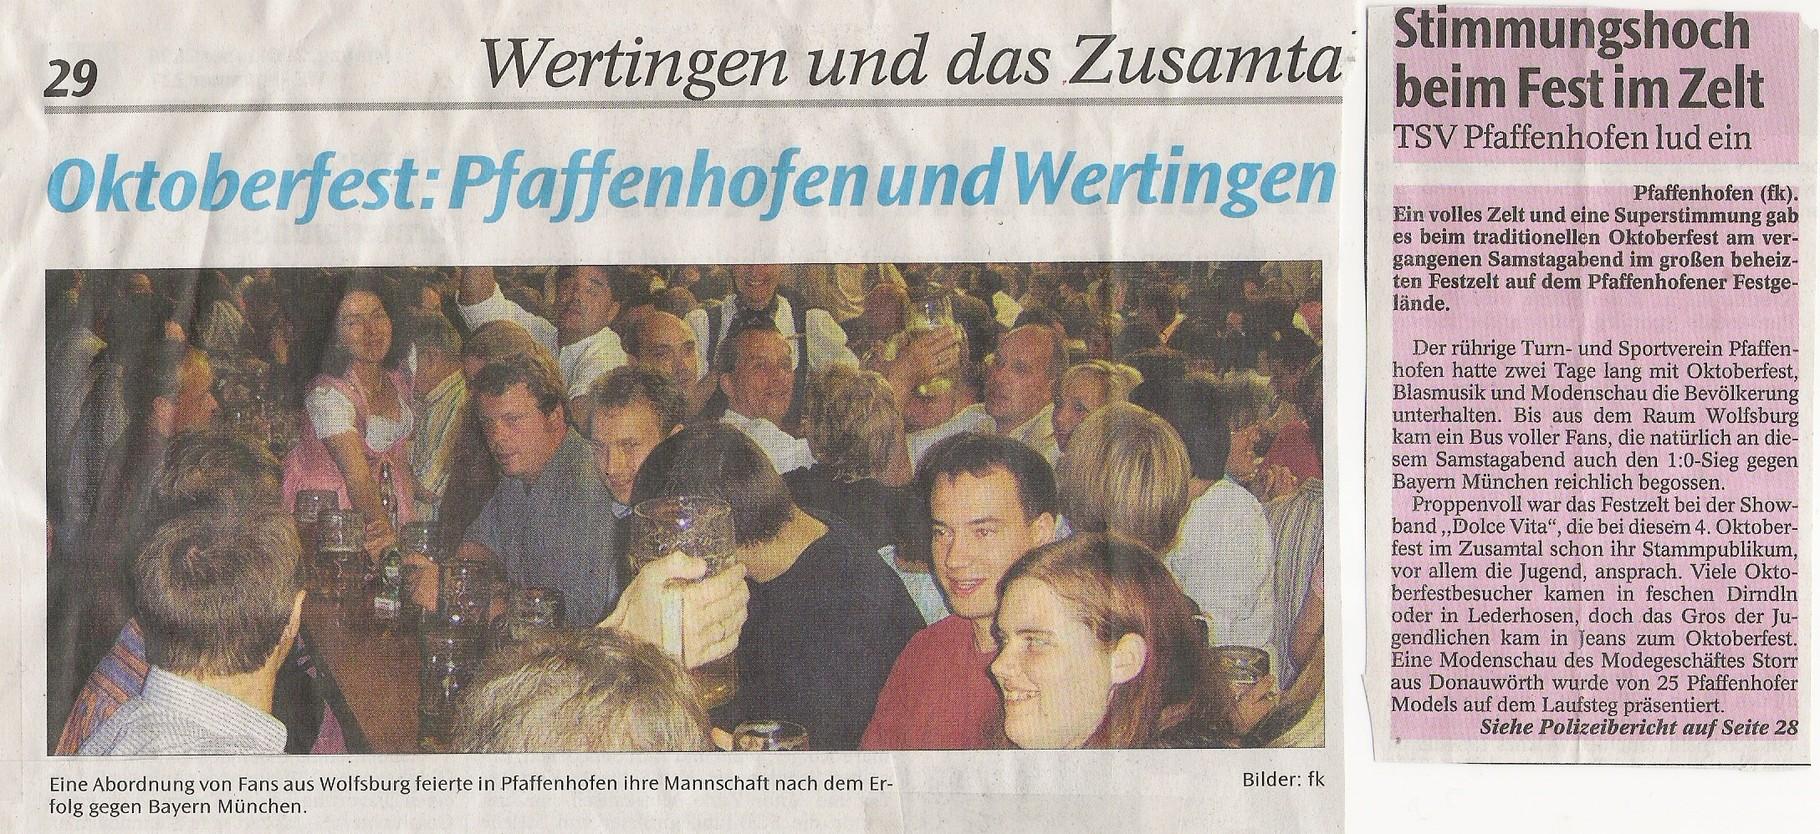 2008 Oktoberfest Pfaffenhofen